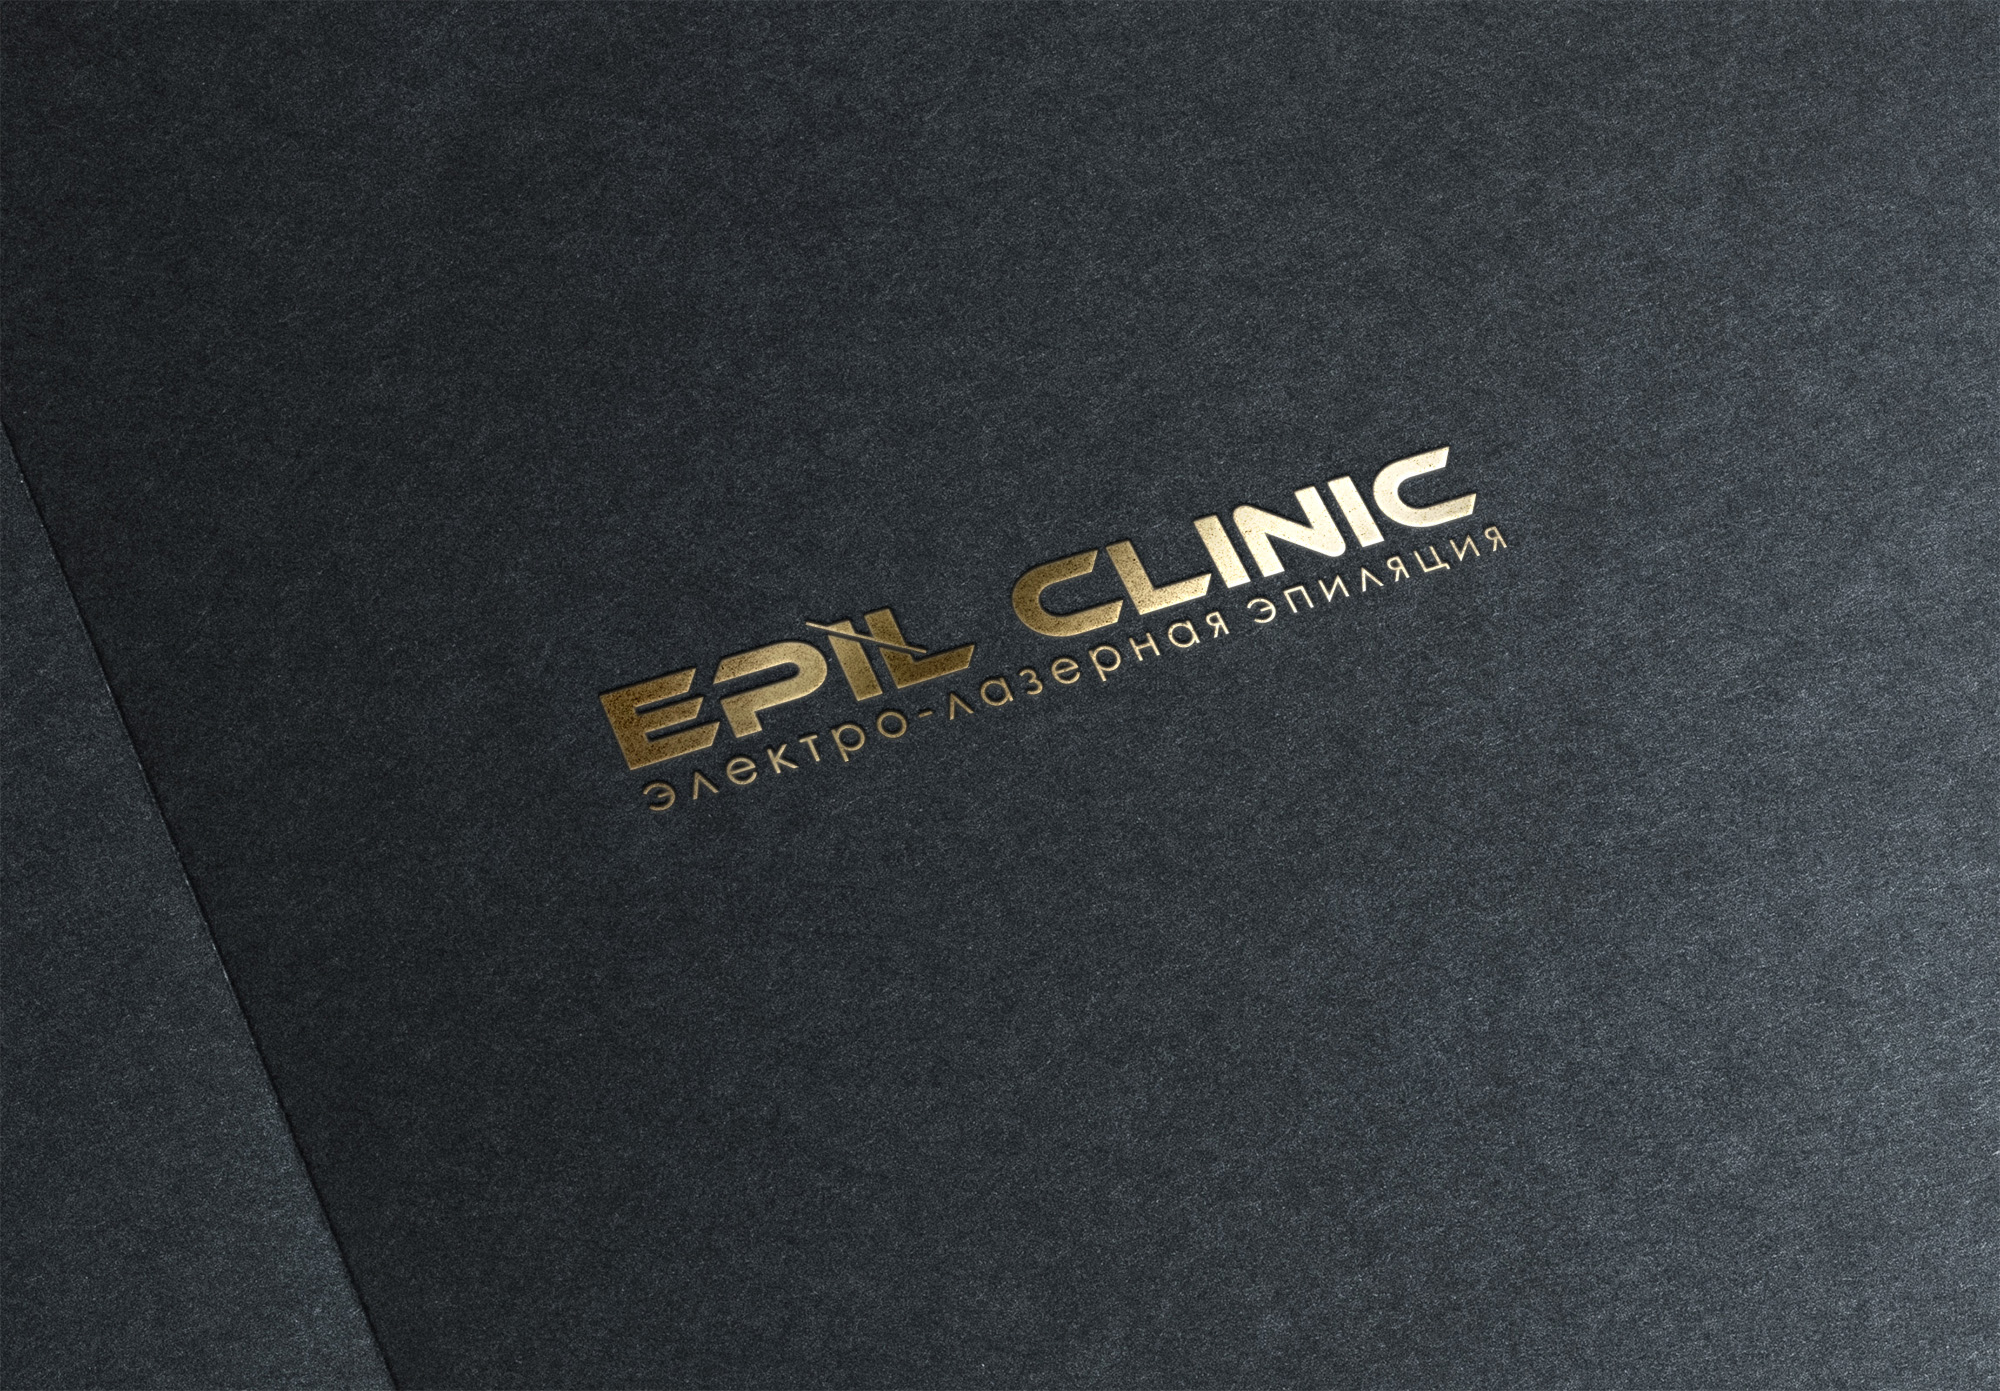 Логотип , фирменный стиль  фото f_8975e180810dc97f.jpg